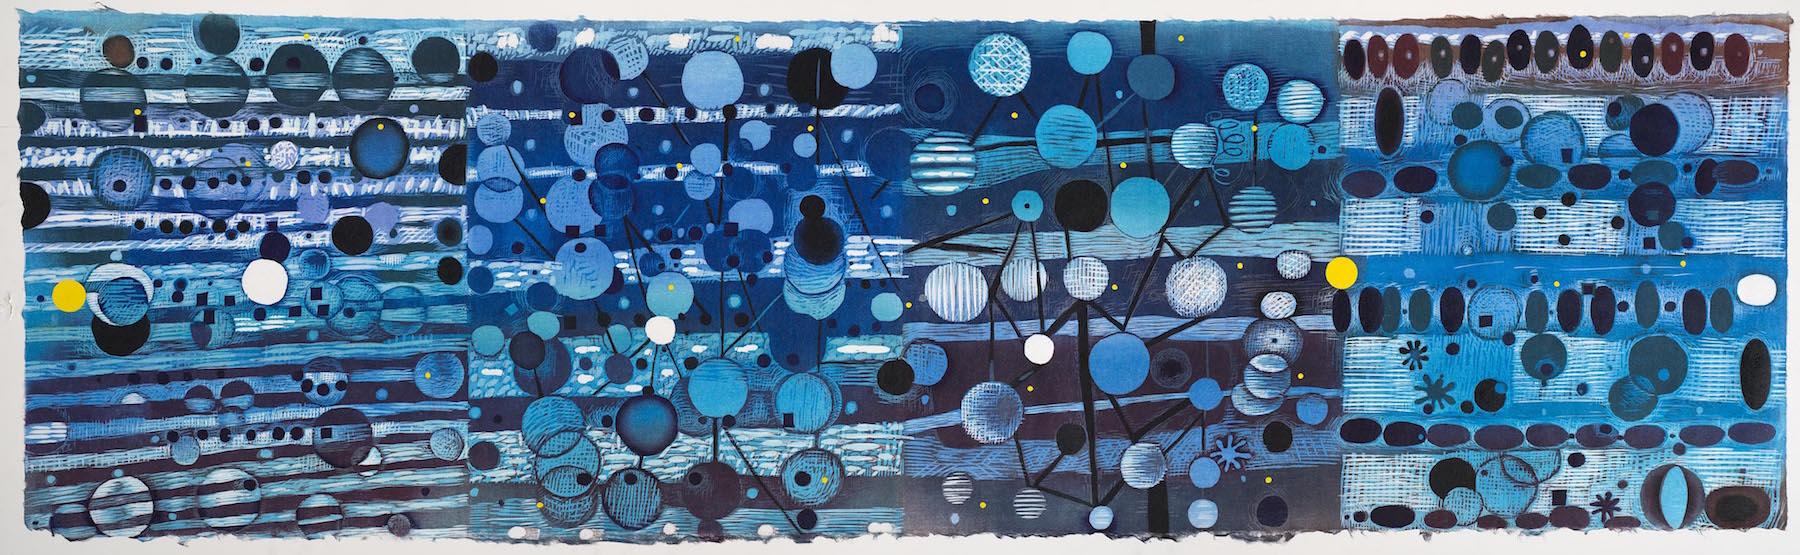 "Karen Kunc  (BIO) ,  Oscillation Shift  , 2015, woodcut, 17"" x 56"""